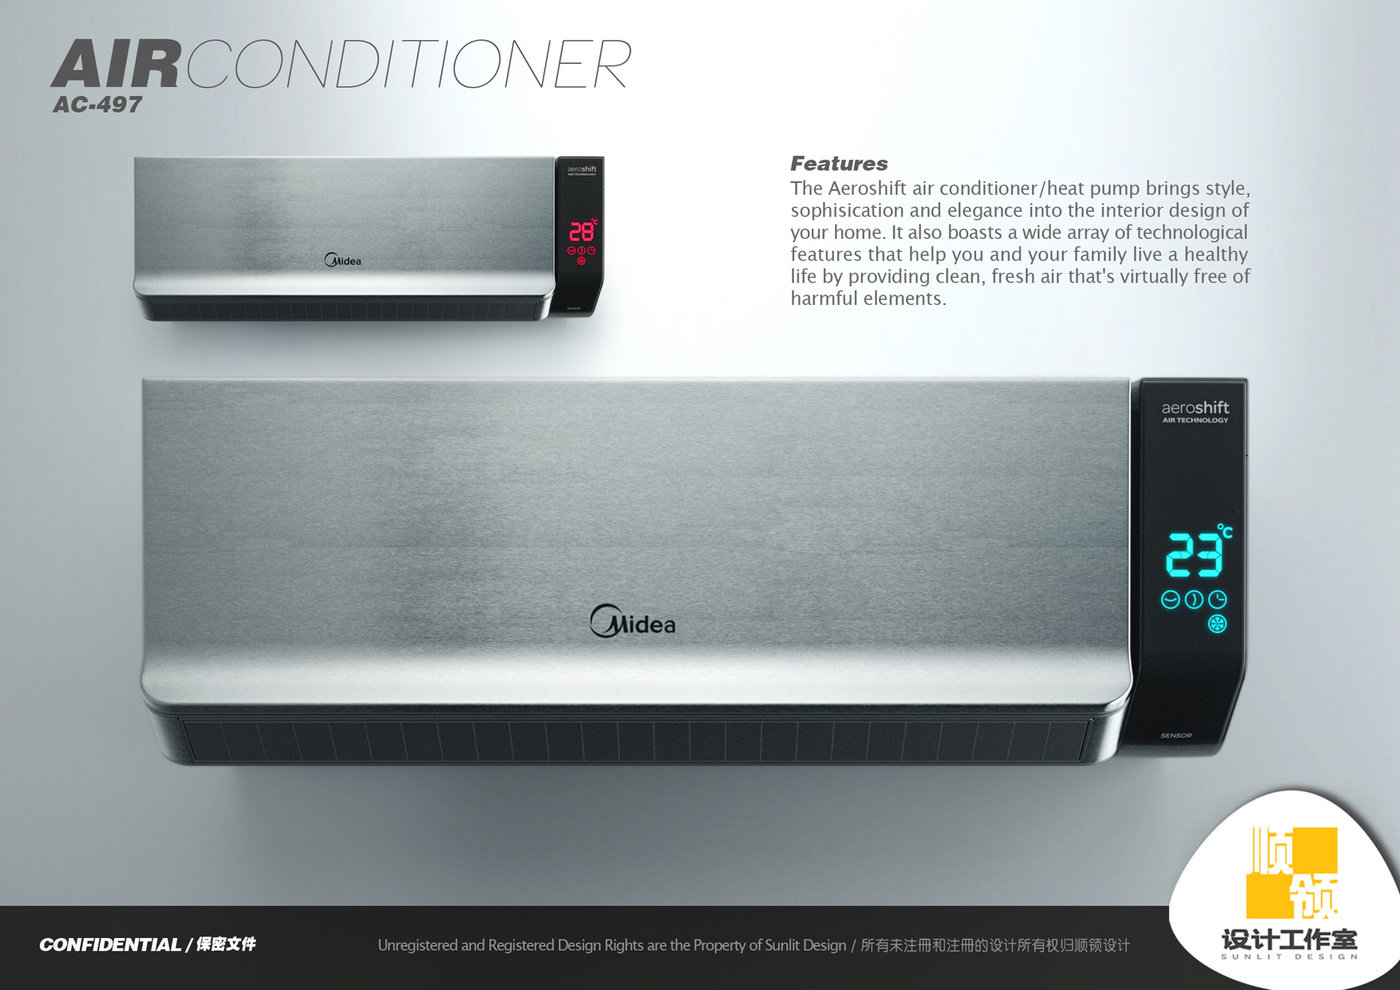 Midea Air Conditioner by Hugo Cailleton at Coroflot.com